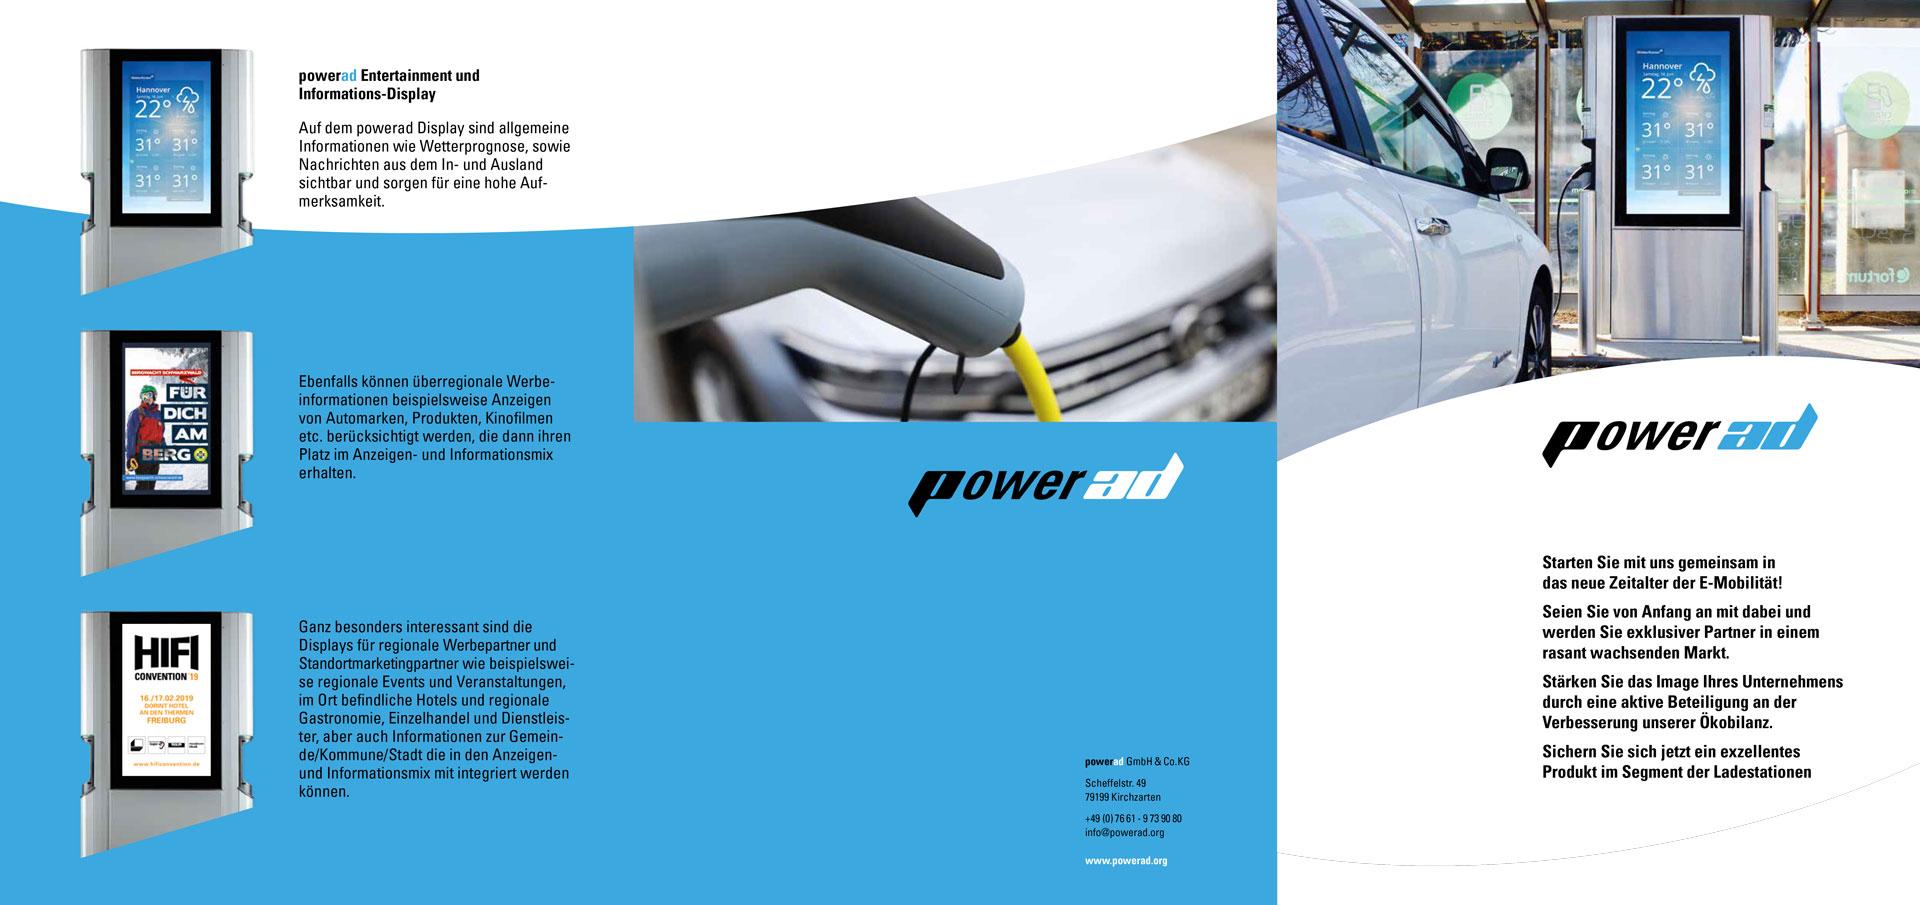 powerad_Logo_FB-1